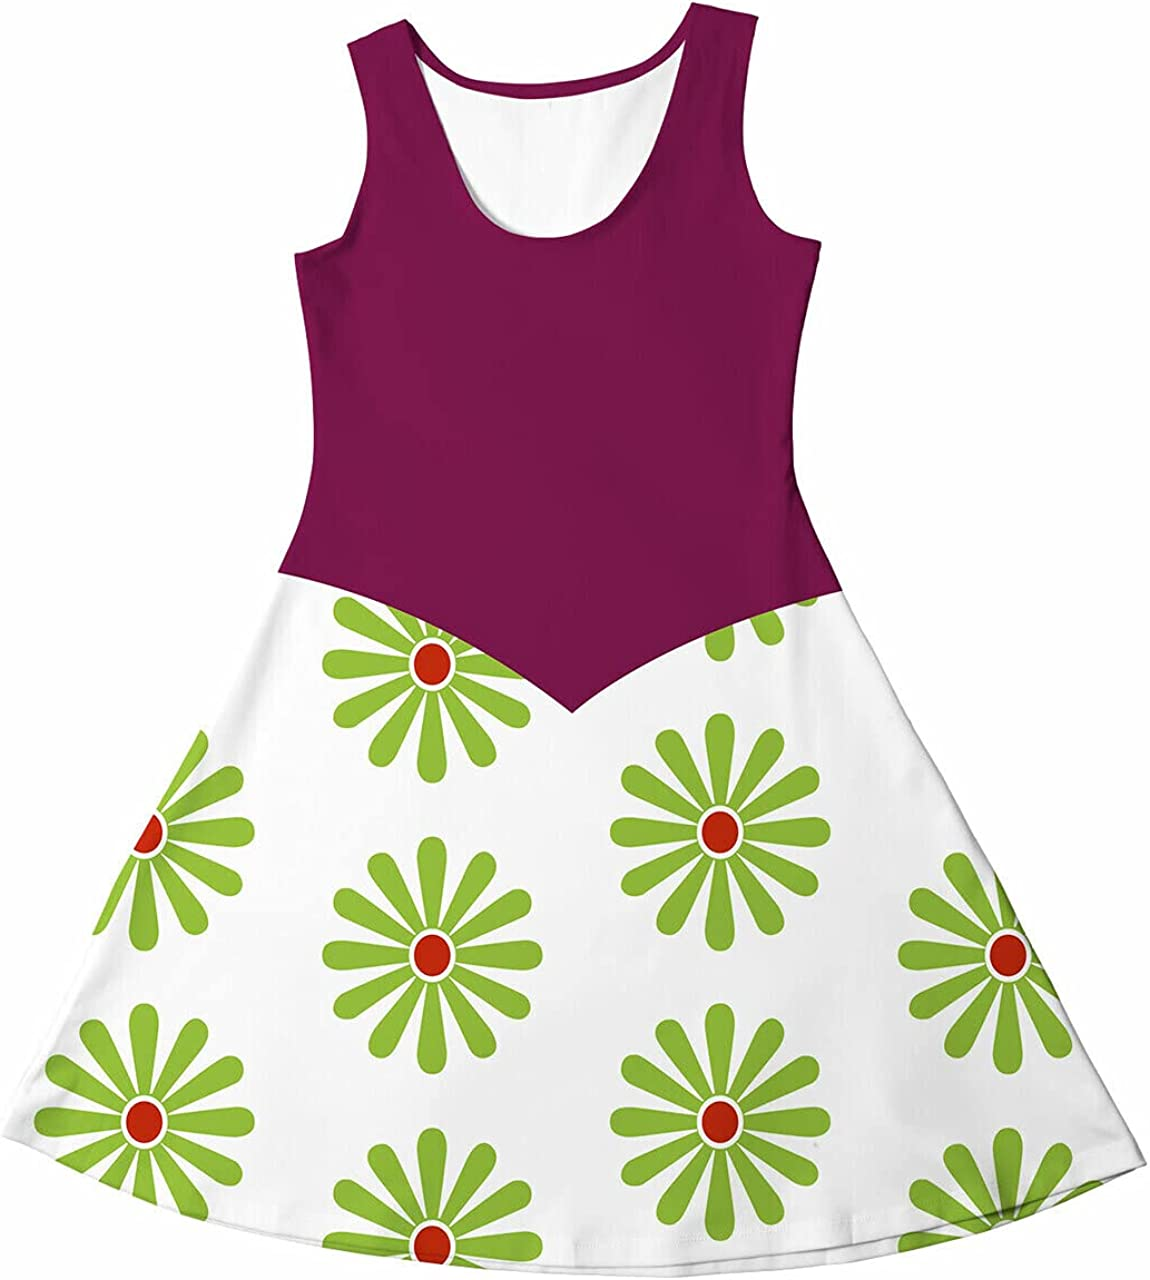 Rainbow Rules Girls Sleeveless Dress Mansion Las Vegas Mall - Haunted Tightrope Super-cheap